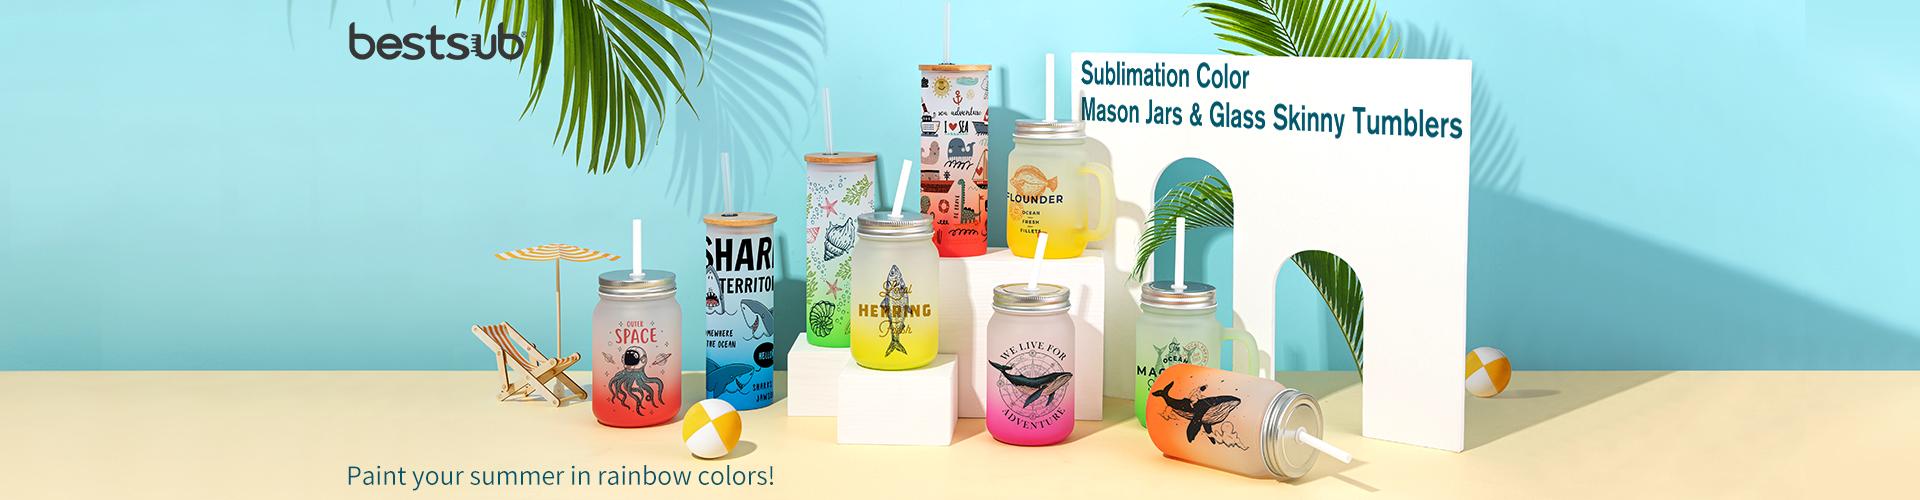 2021-07-26_Sublimation_Color_Mason_Jars_Glass_Skinny_Tumblers_new_web